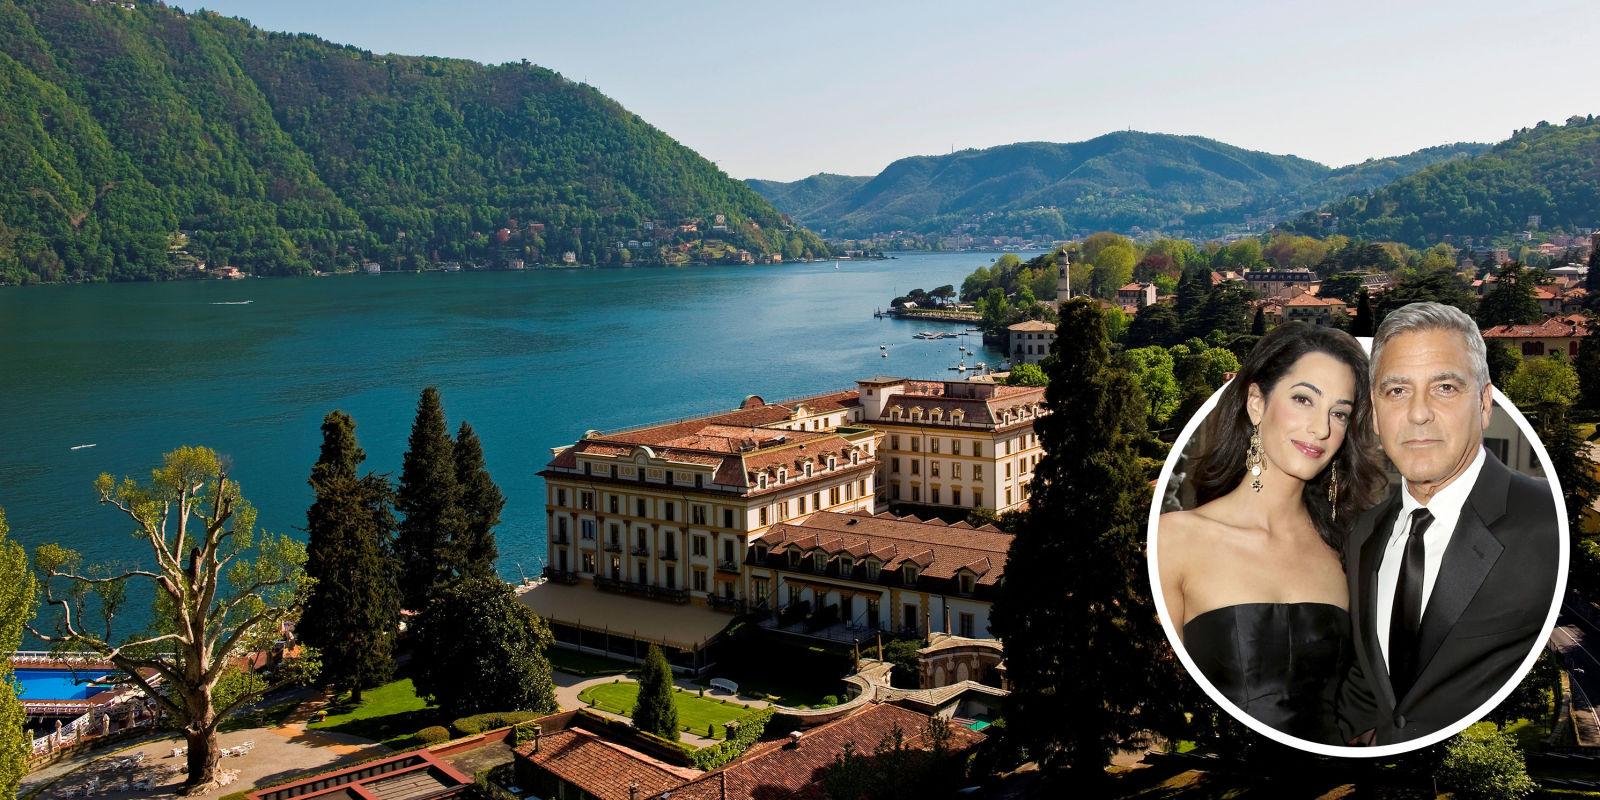 Villa d 39 este hotel review lake como italy george clooney for Villa d este como ristorante